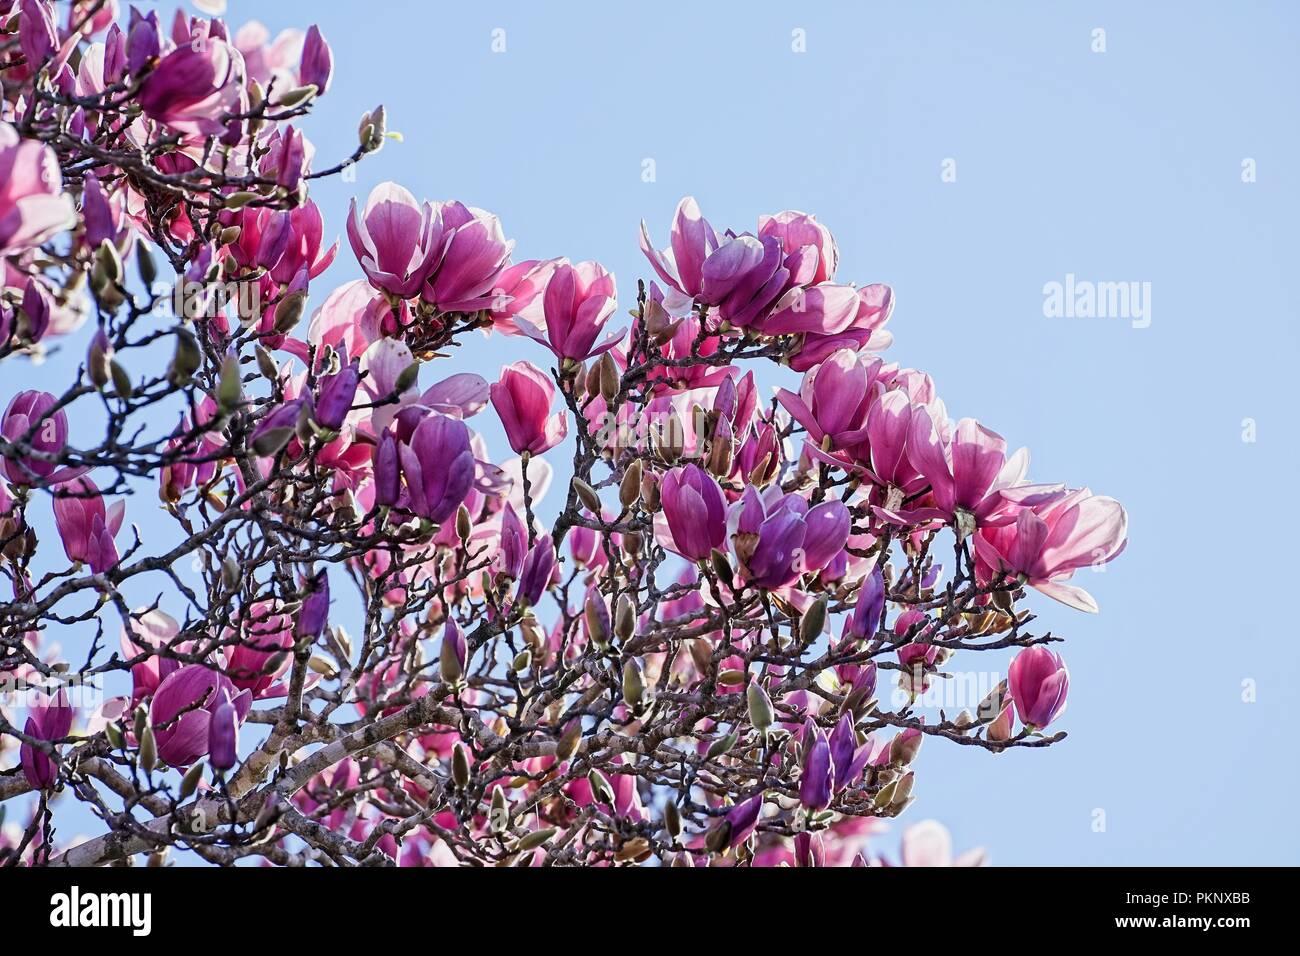 Large Magnolia Imágenes De Stock   Large Magnolia Fotos De Stock - Alamy 7bb02c0b0e6